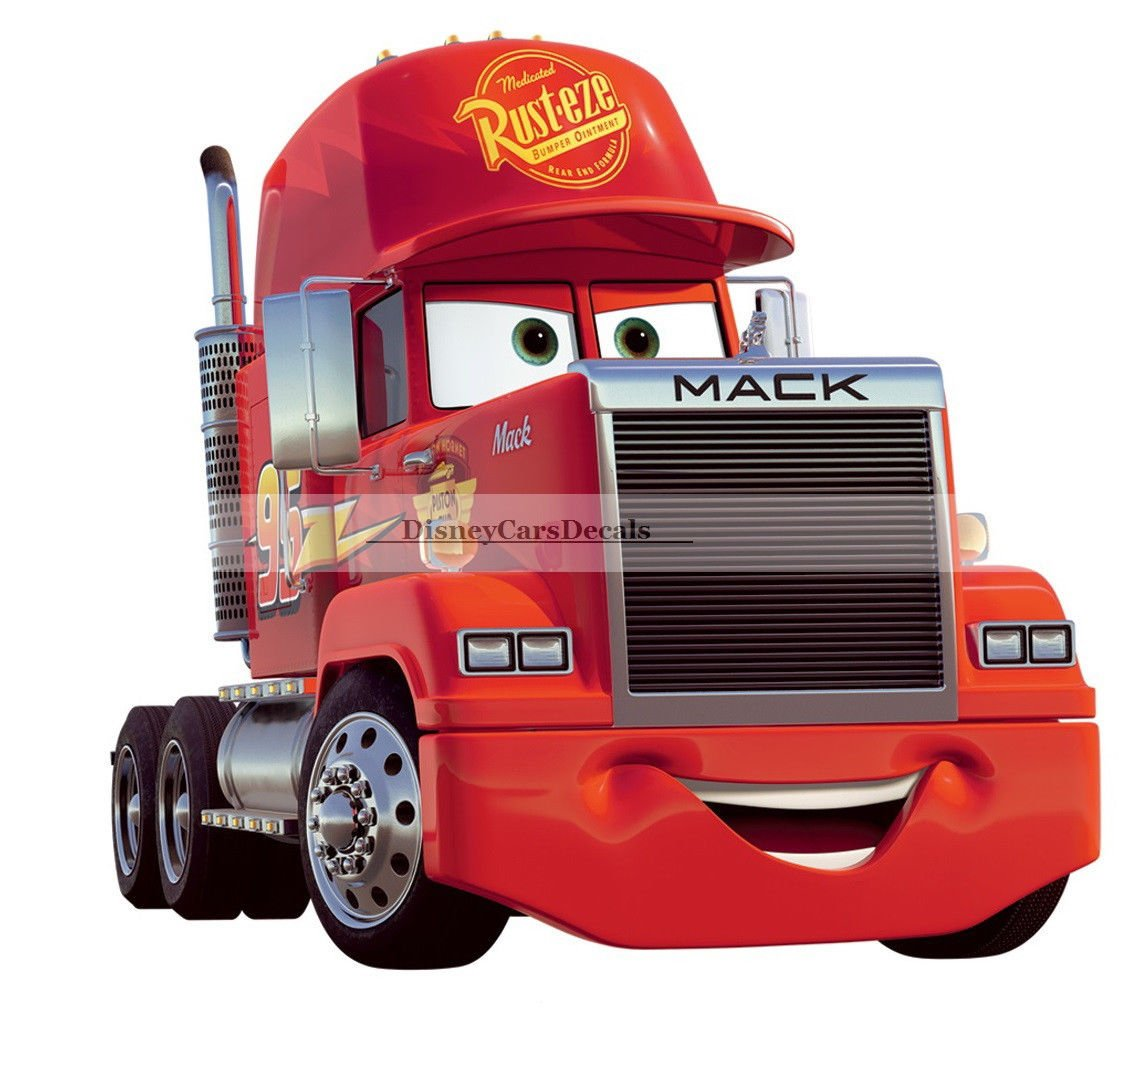 Mack truck cars Disney Autocollant amovible Wall Sticker Home Decor Art livraison gratuite